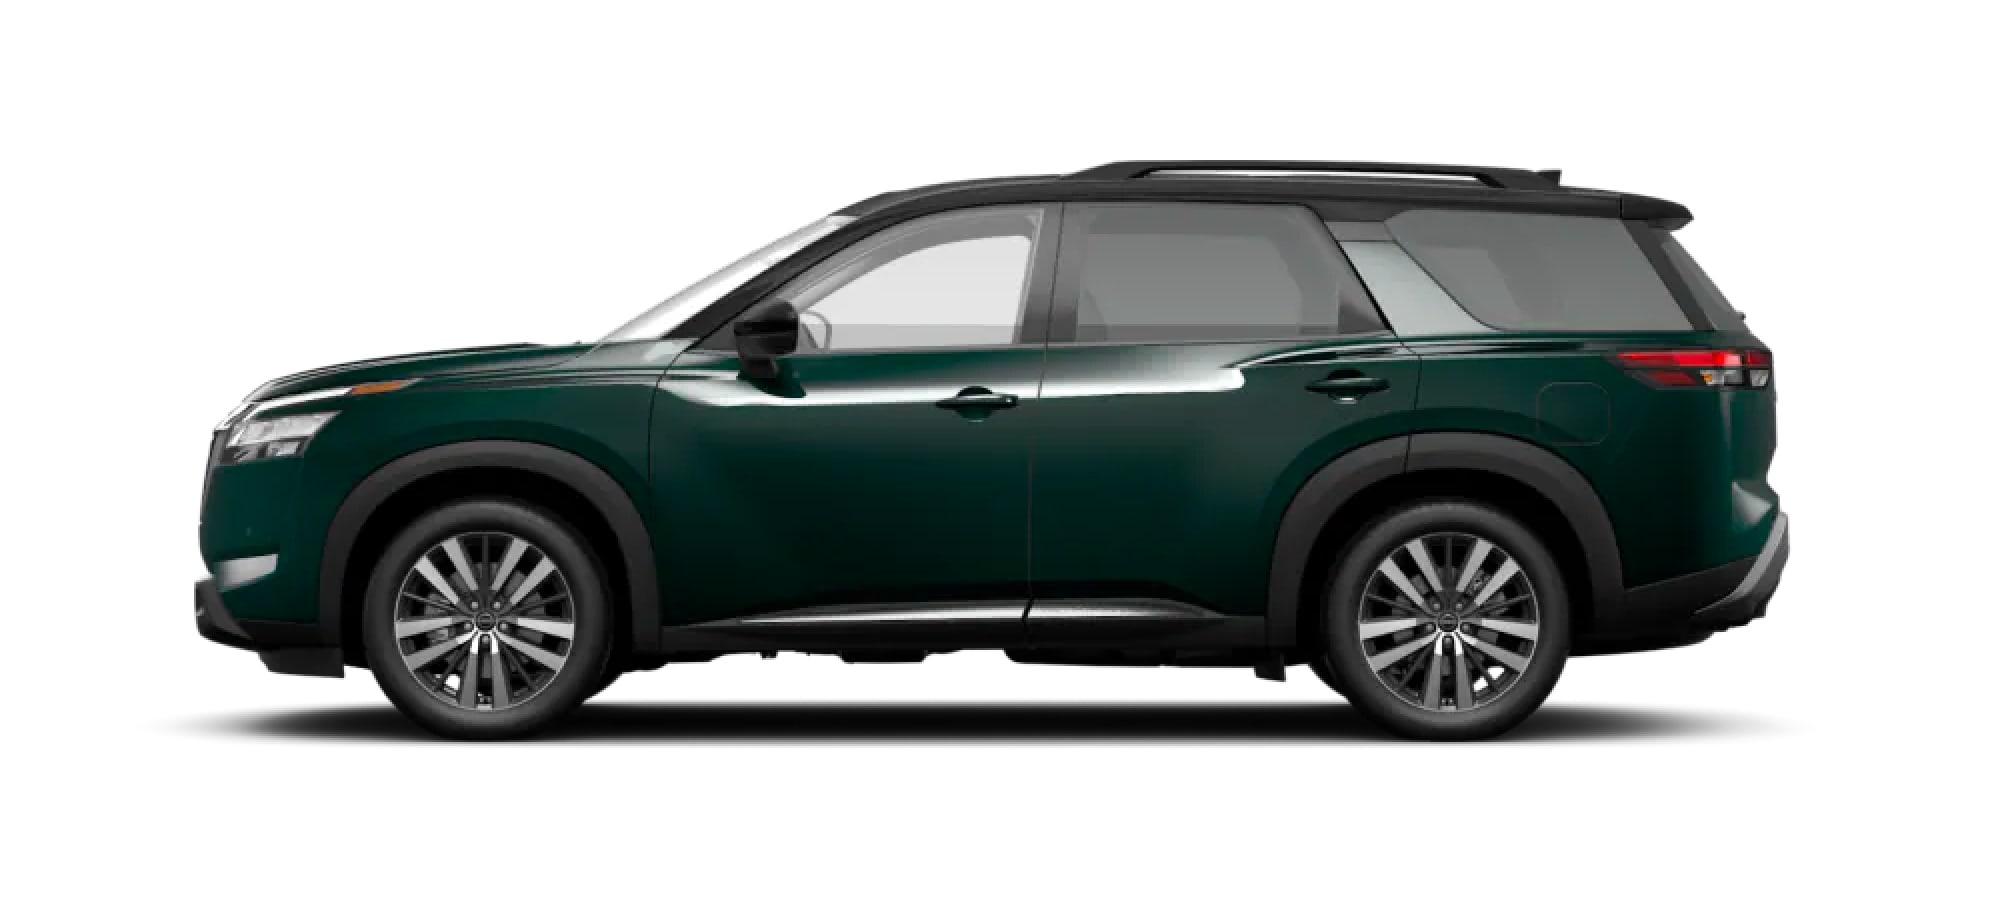 2022 Nissan Pathfinder in Two-Tone Obsidian Green Pearl / Super Black